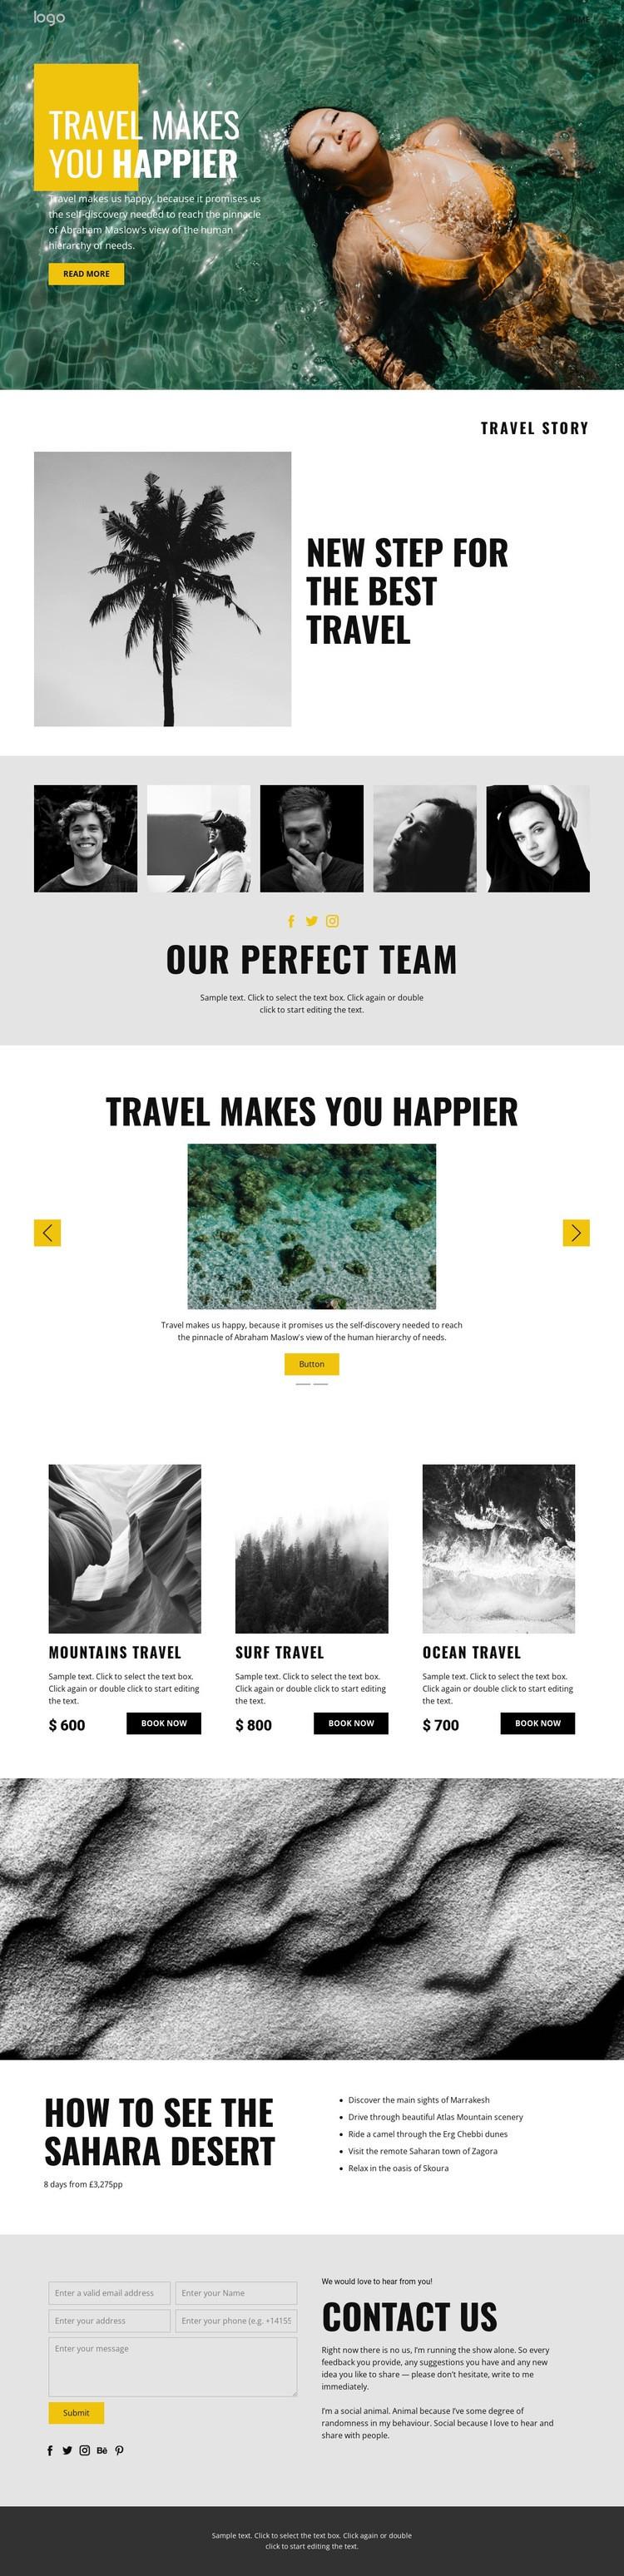 Happy people deserve travel Html Code Example